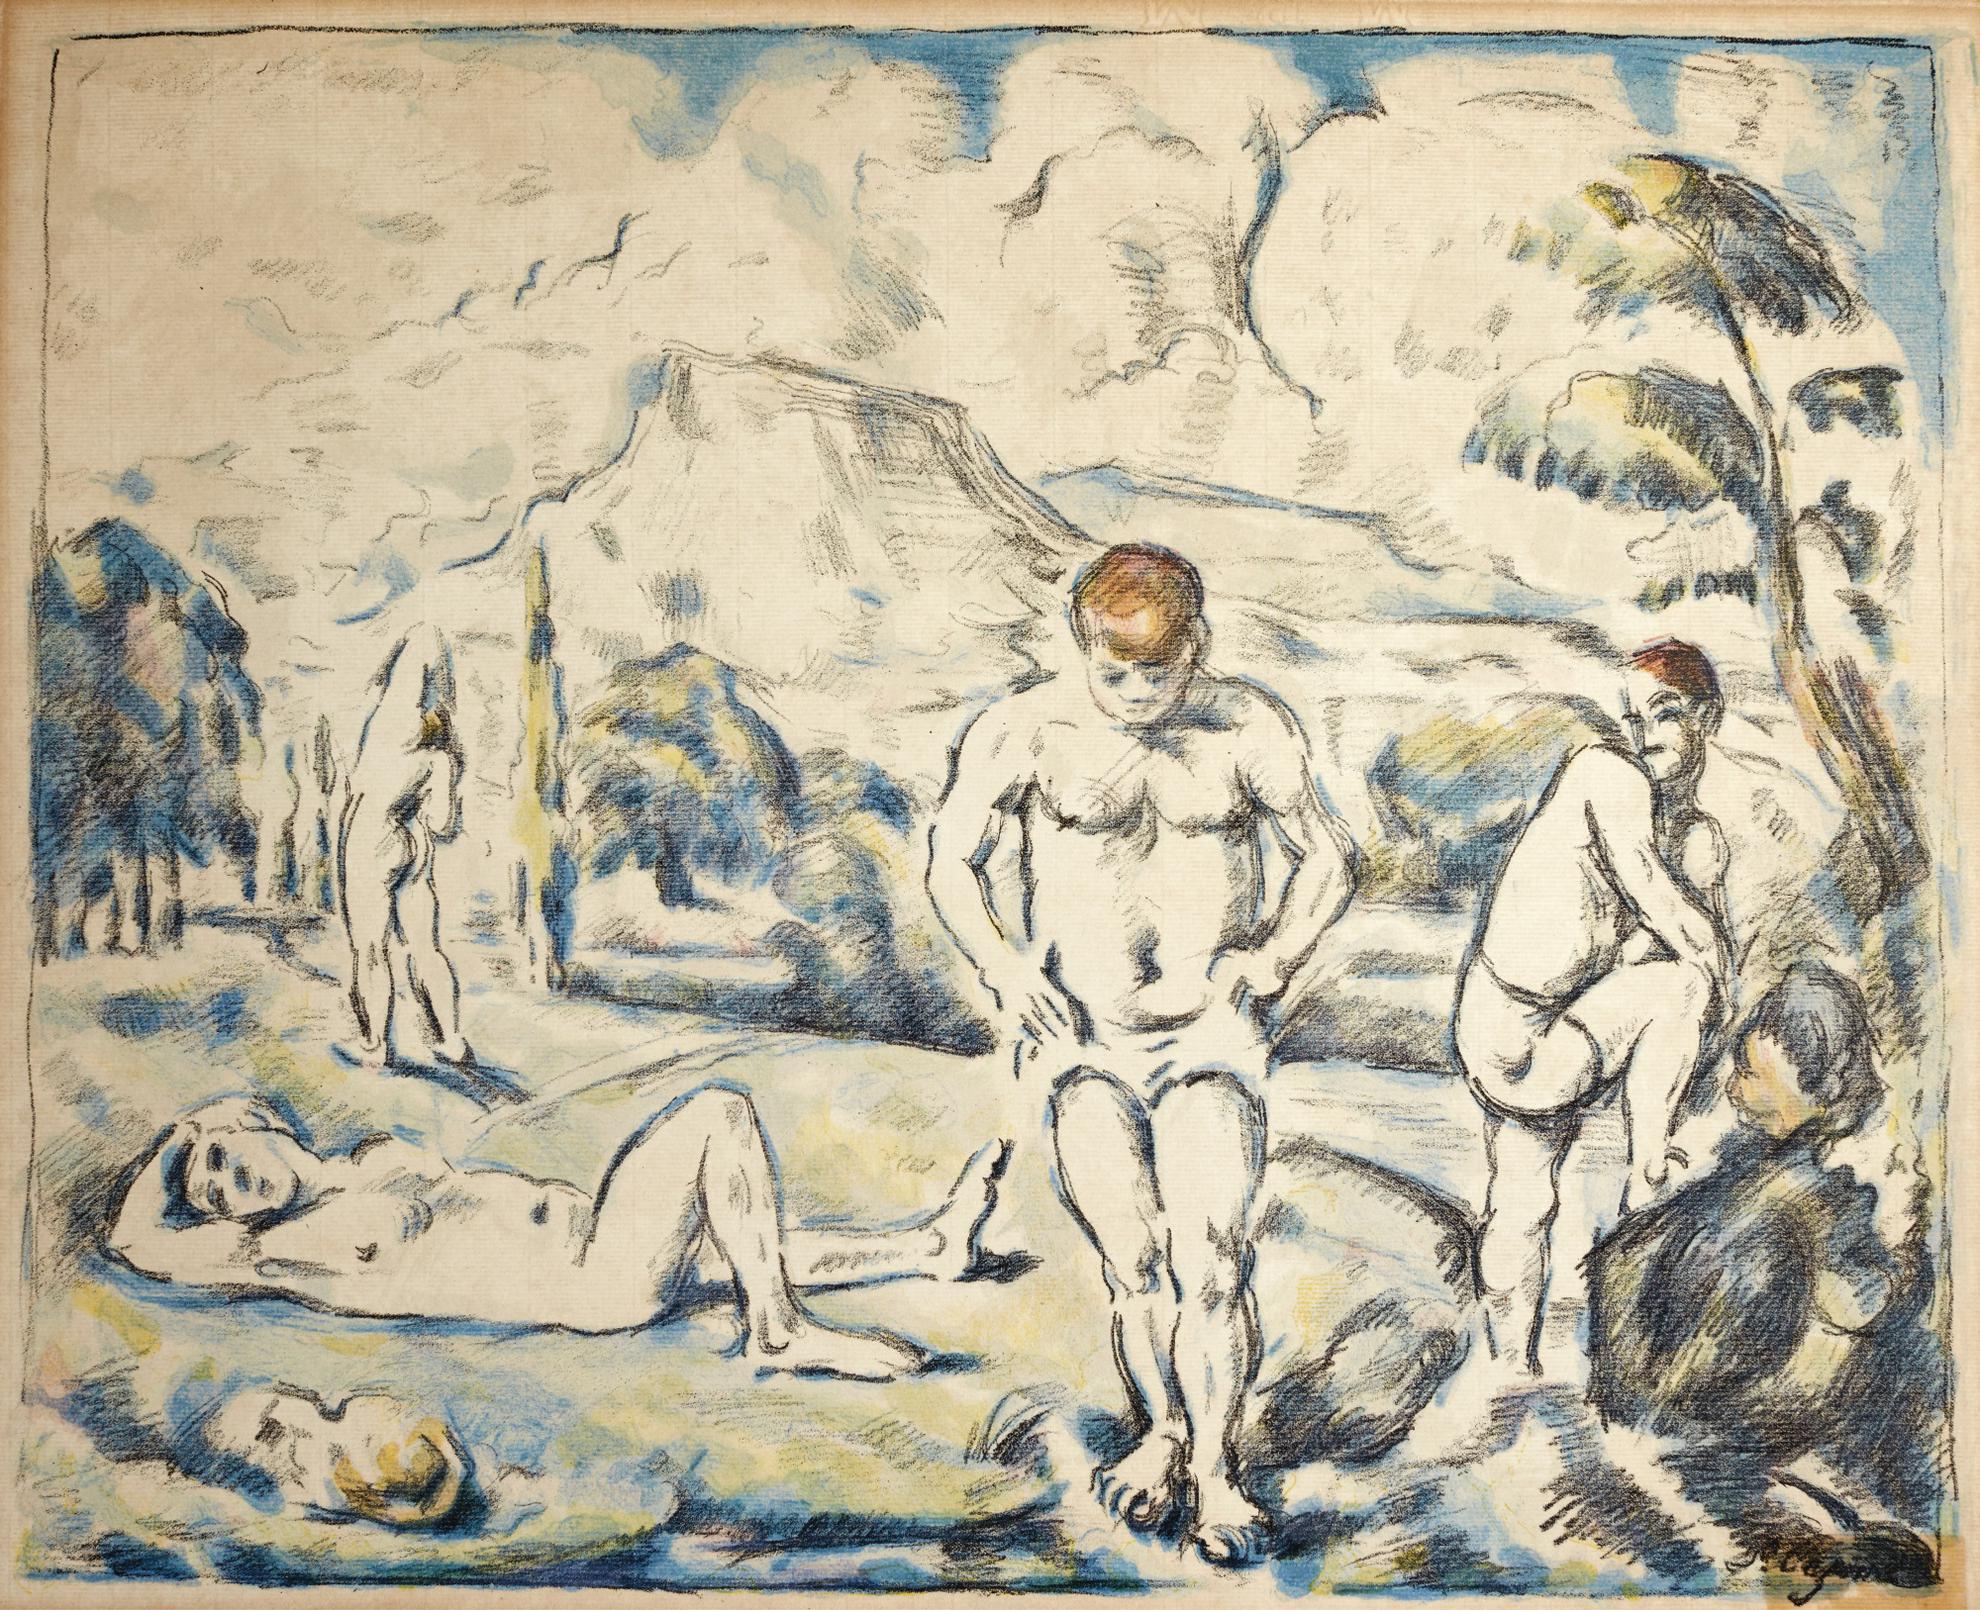 Paul Cezanne-Les Baigneurs (Grande Planche) (Druick I; Venturi 1157)-1898